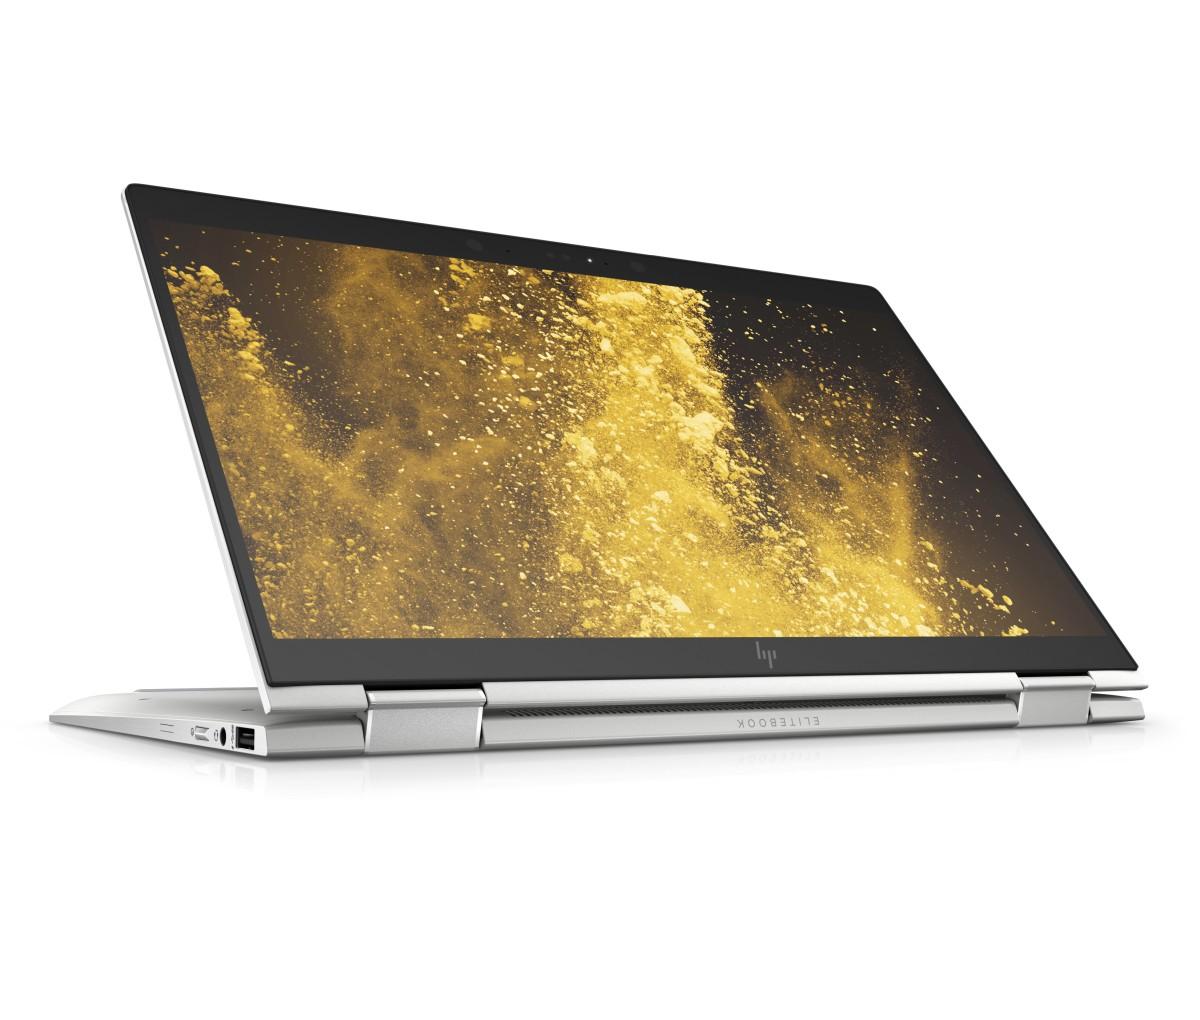 HP EliteBook x360 1030 G4 13,3'' FHD privacy i5-8265U/16GB/512M.2/WF/BT/LTE/W10P+pen